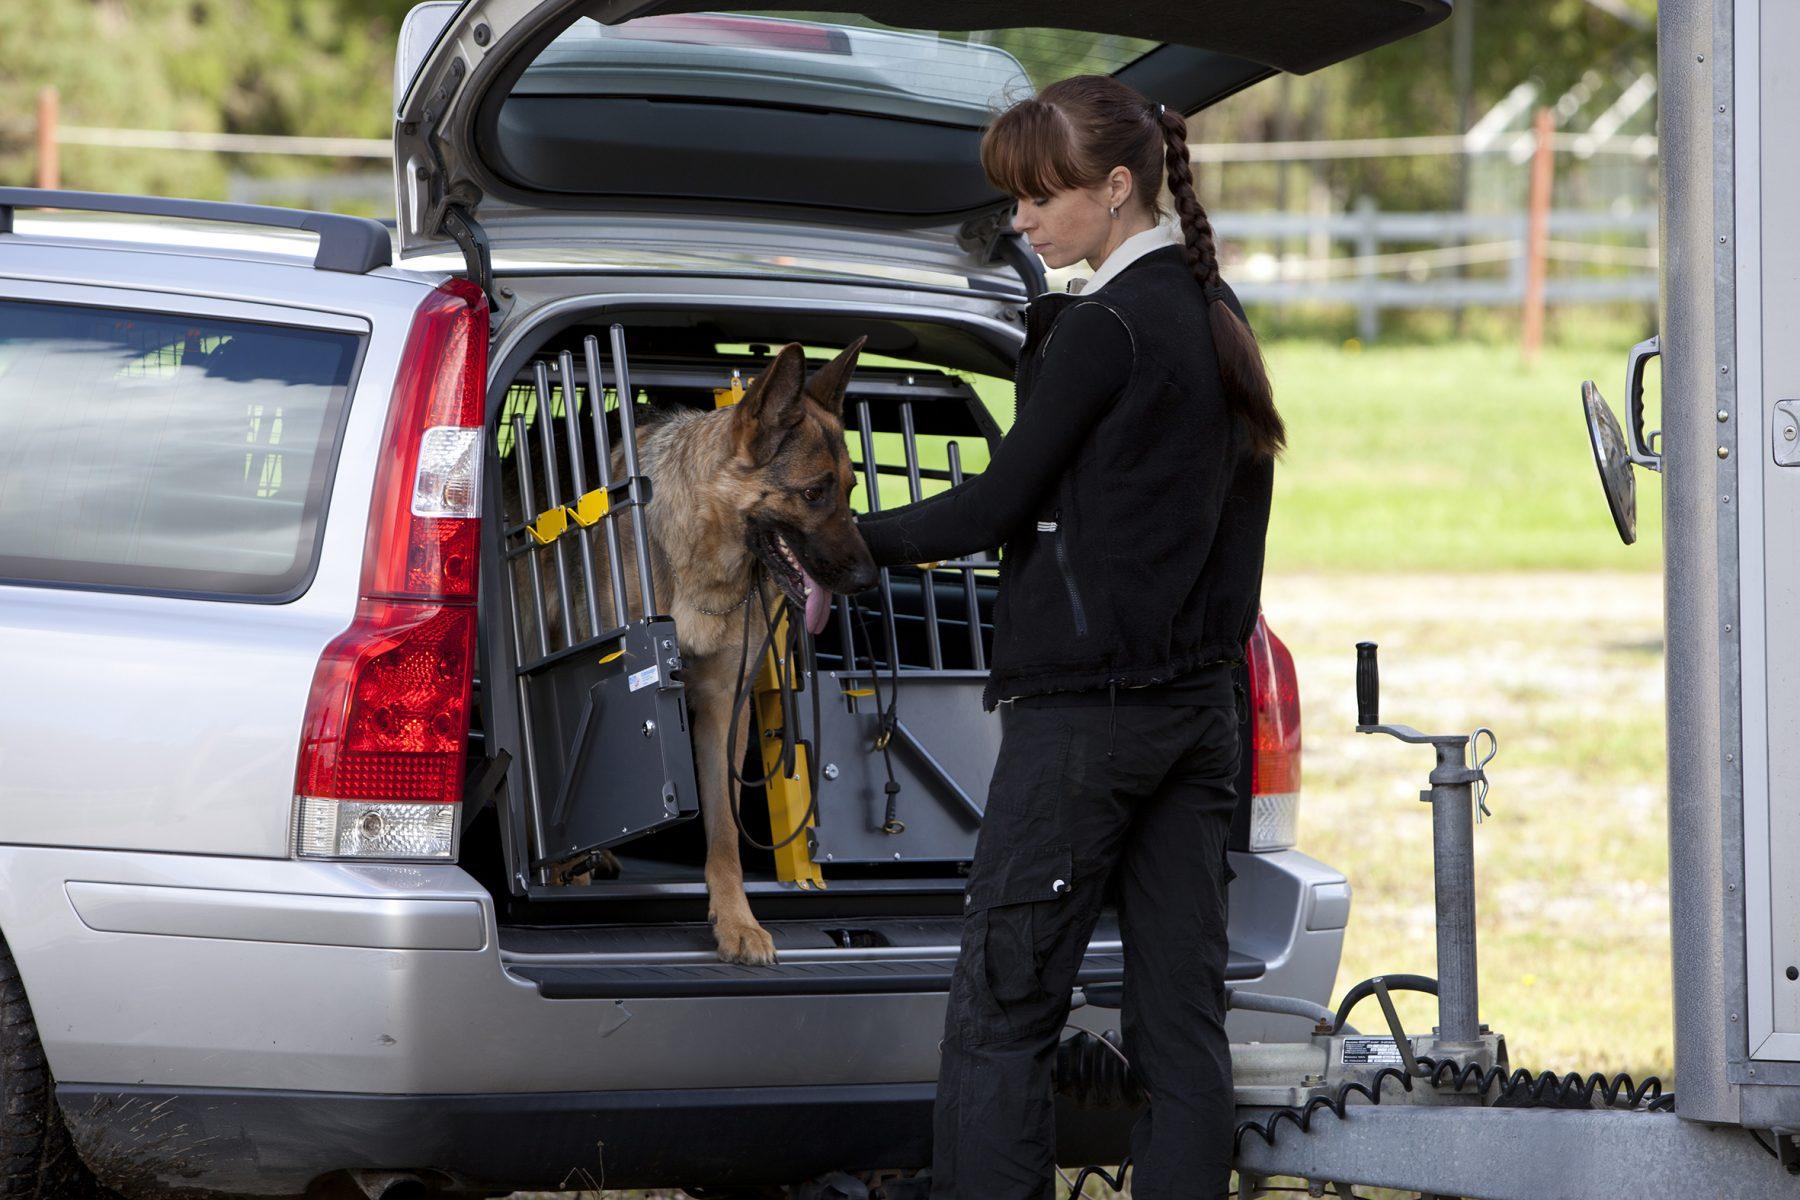 Dogtrainer_summer_horsetrailer_dog_00364_200X130mm_print-1800x1200